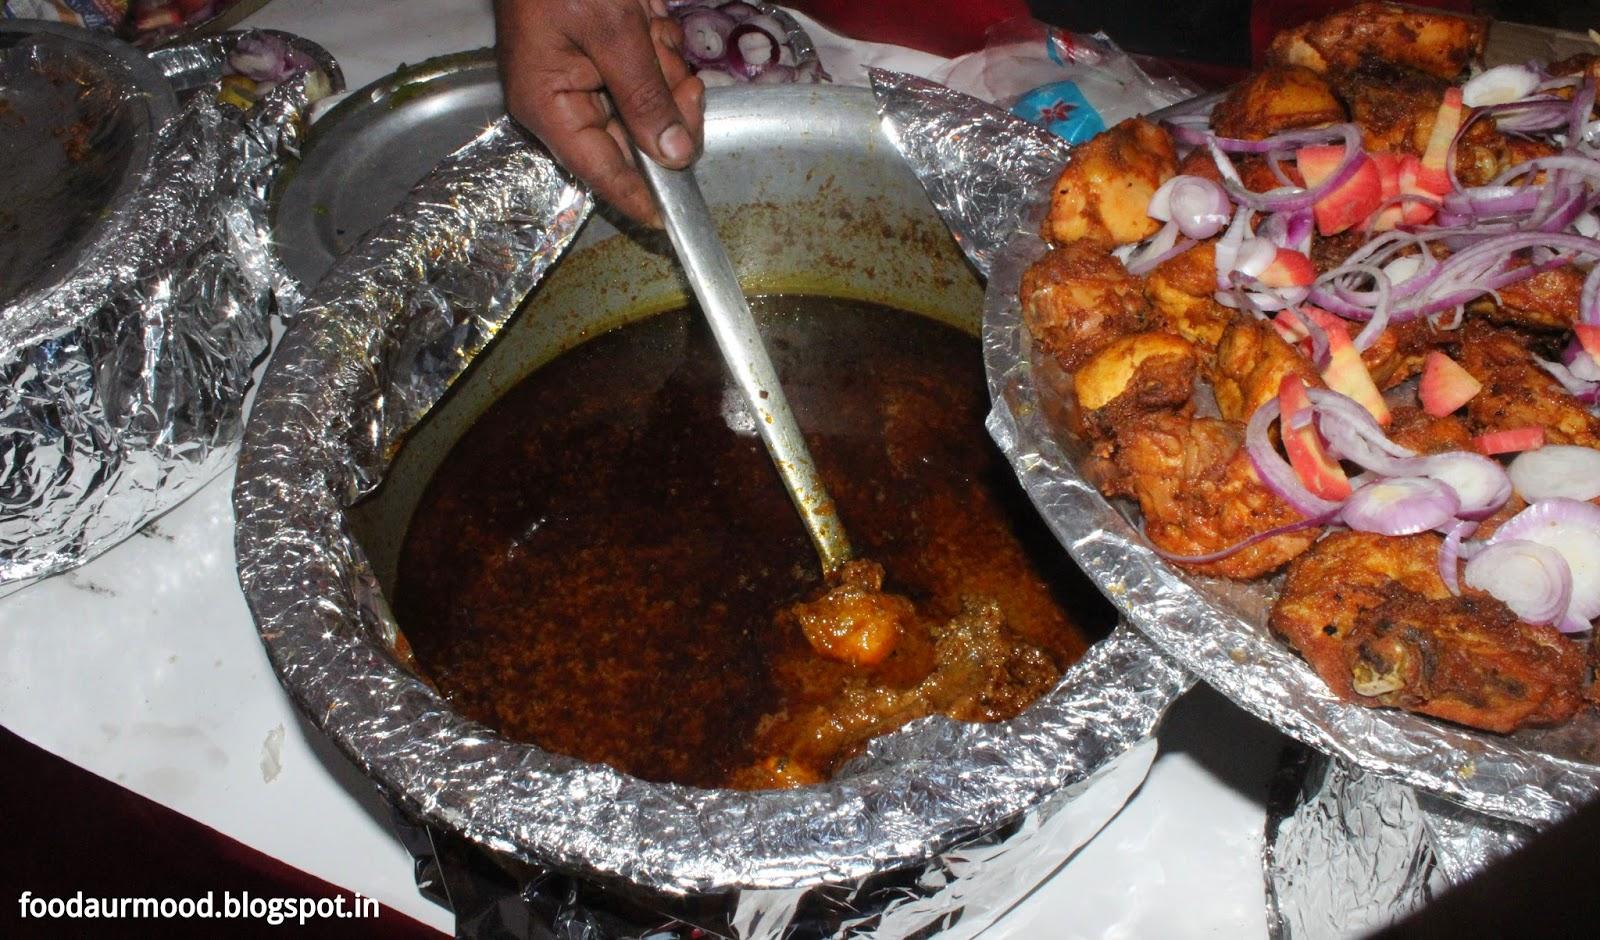 Delhi street food festival 2014